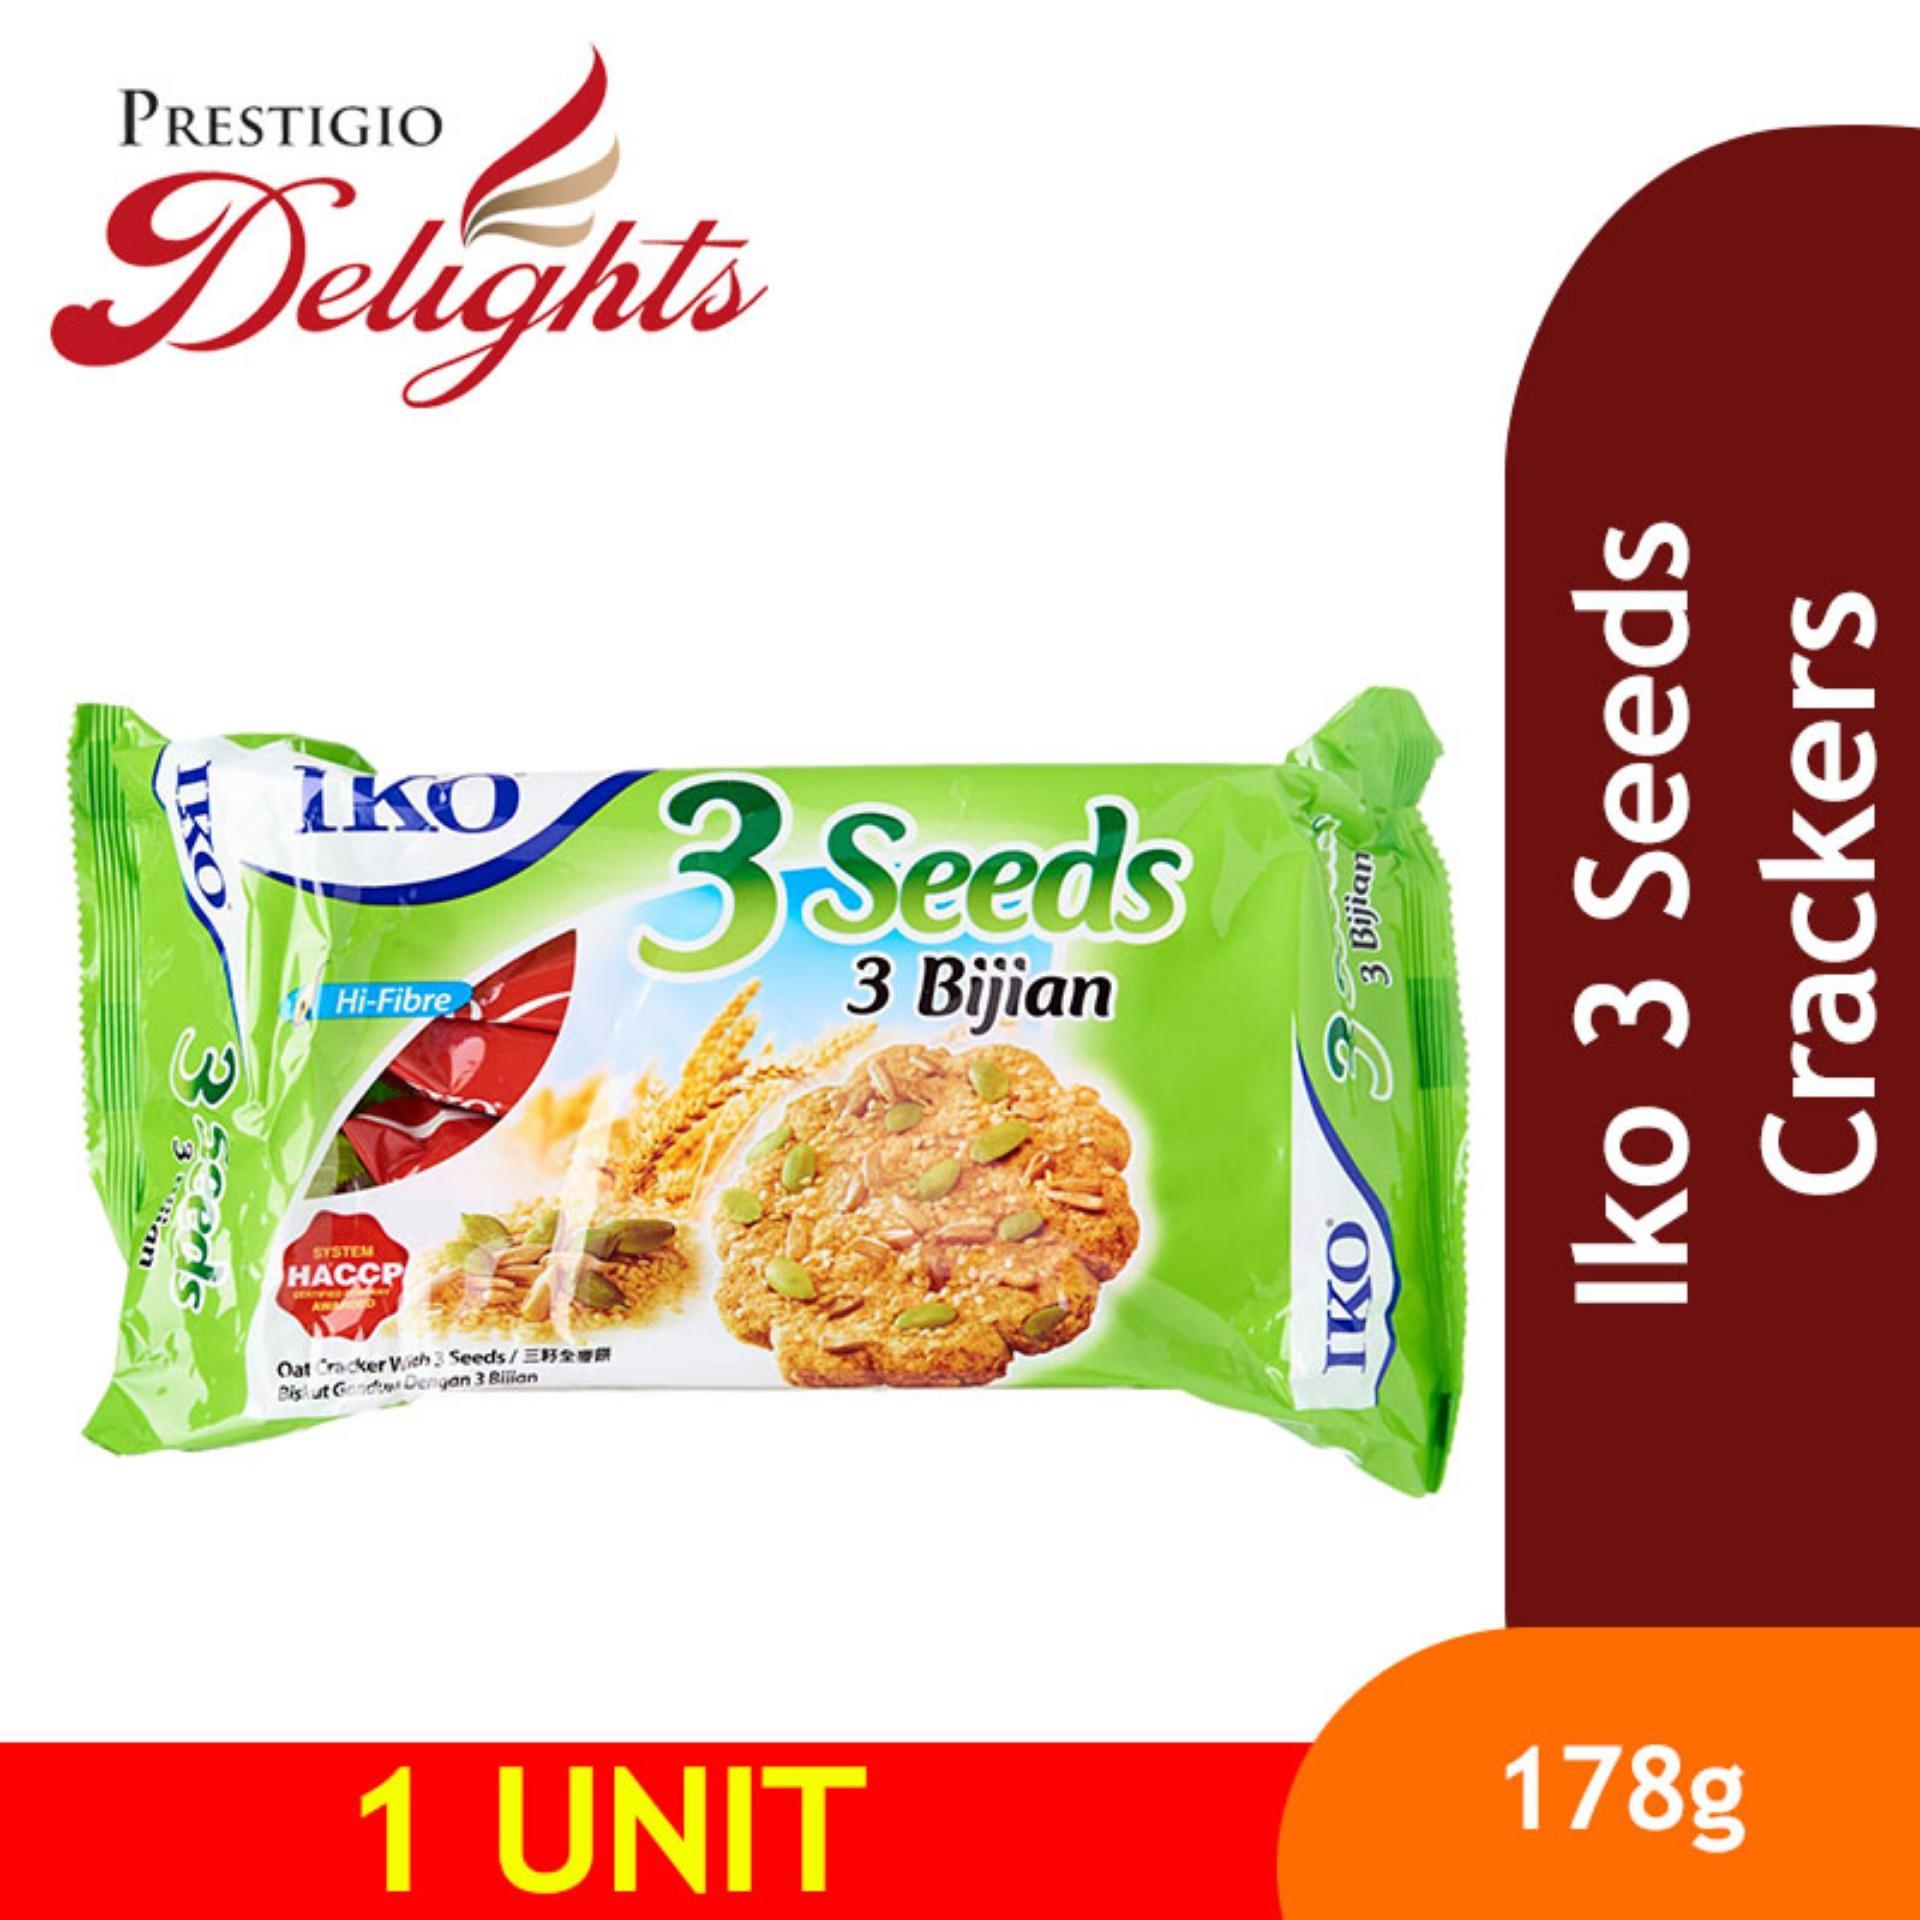 Iko 3 Seeds Crackers By Prestigio Delights.